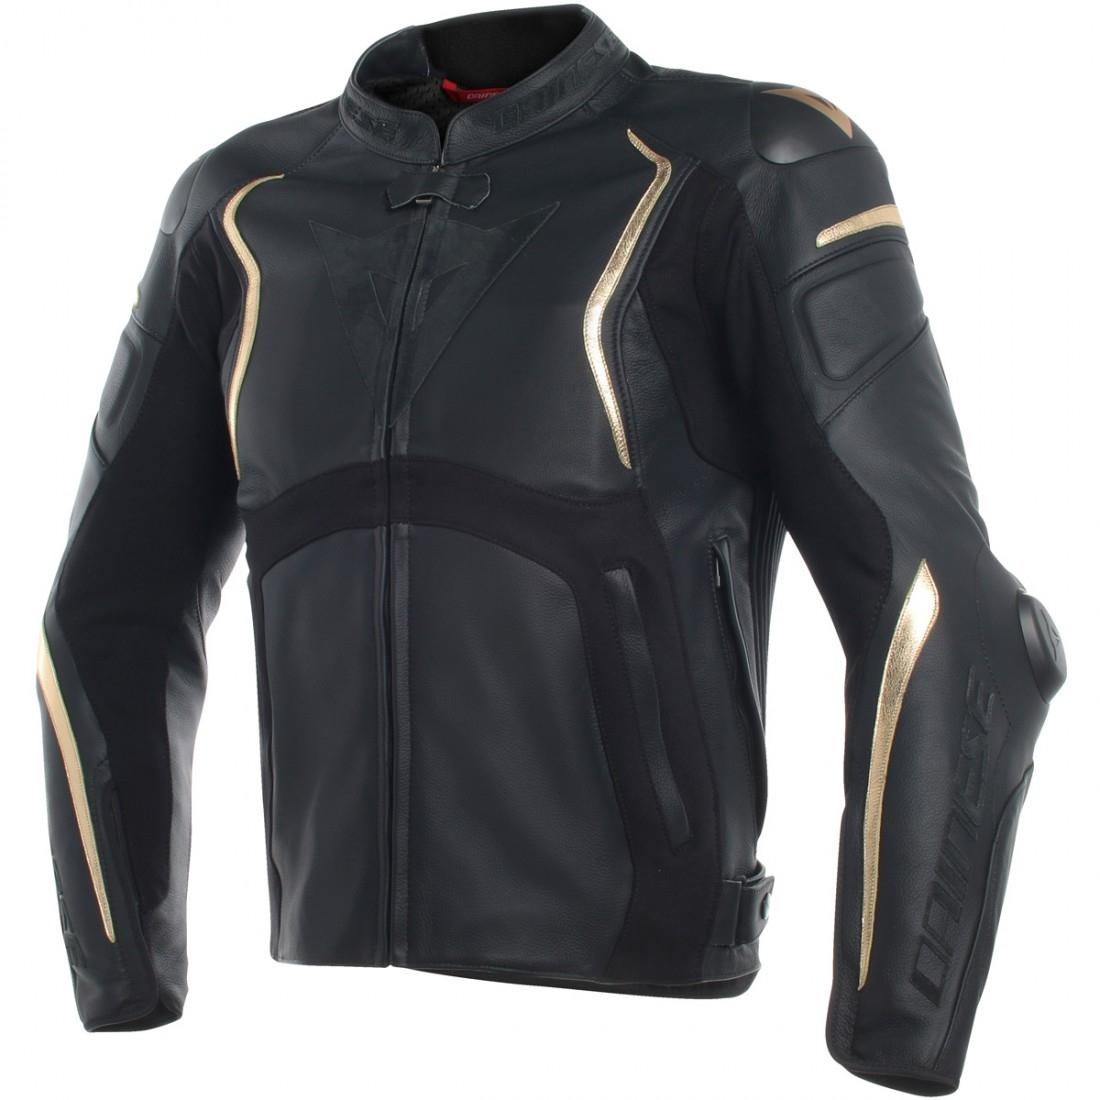 DAINESE Mugello Anniversario Black / Gold Limited Edition Jacket